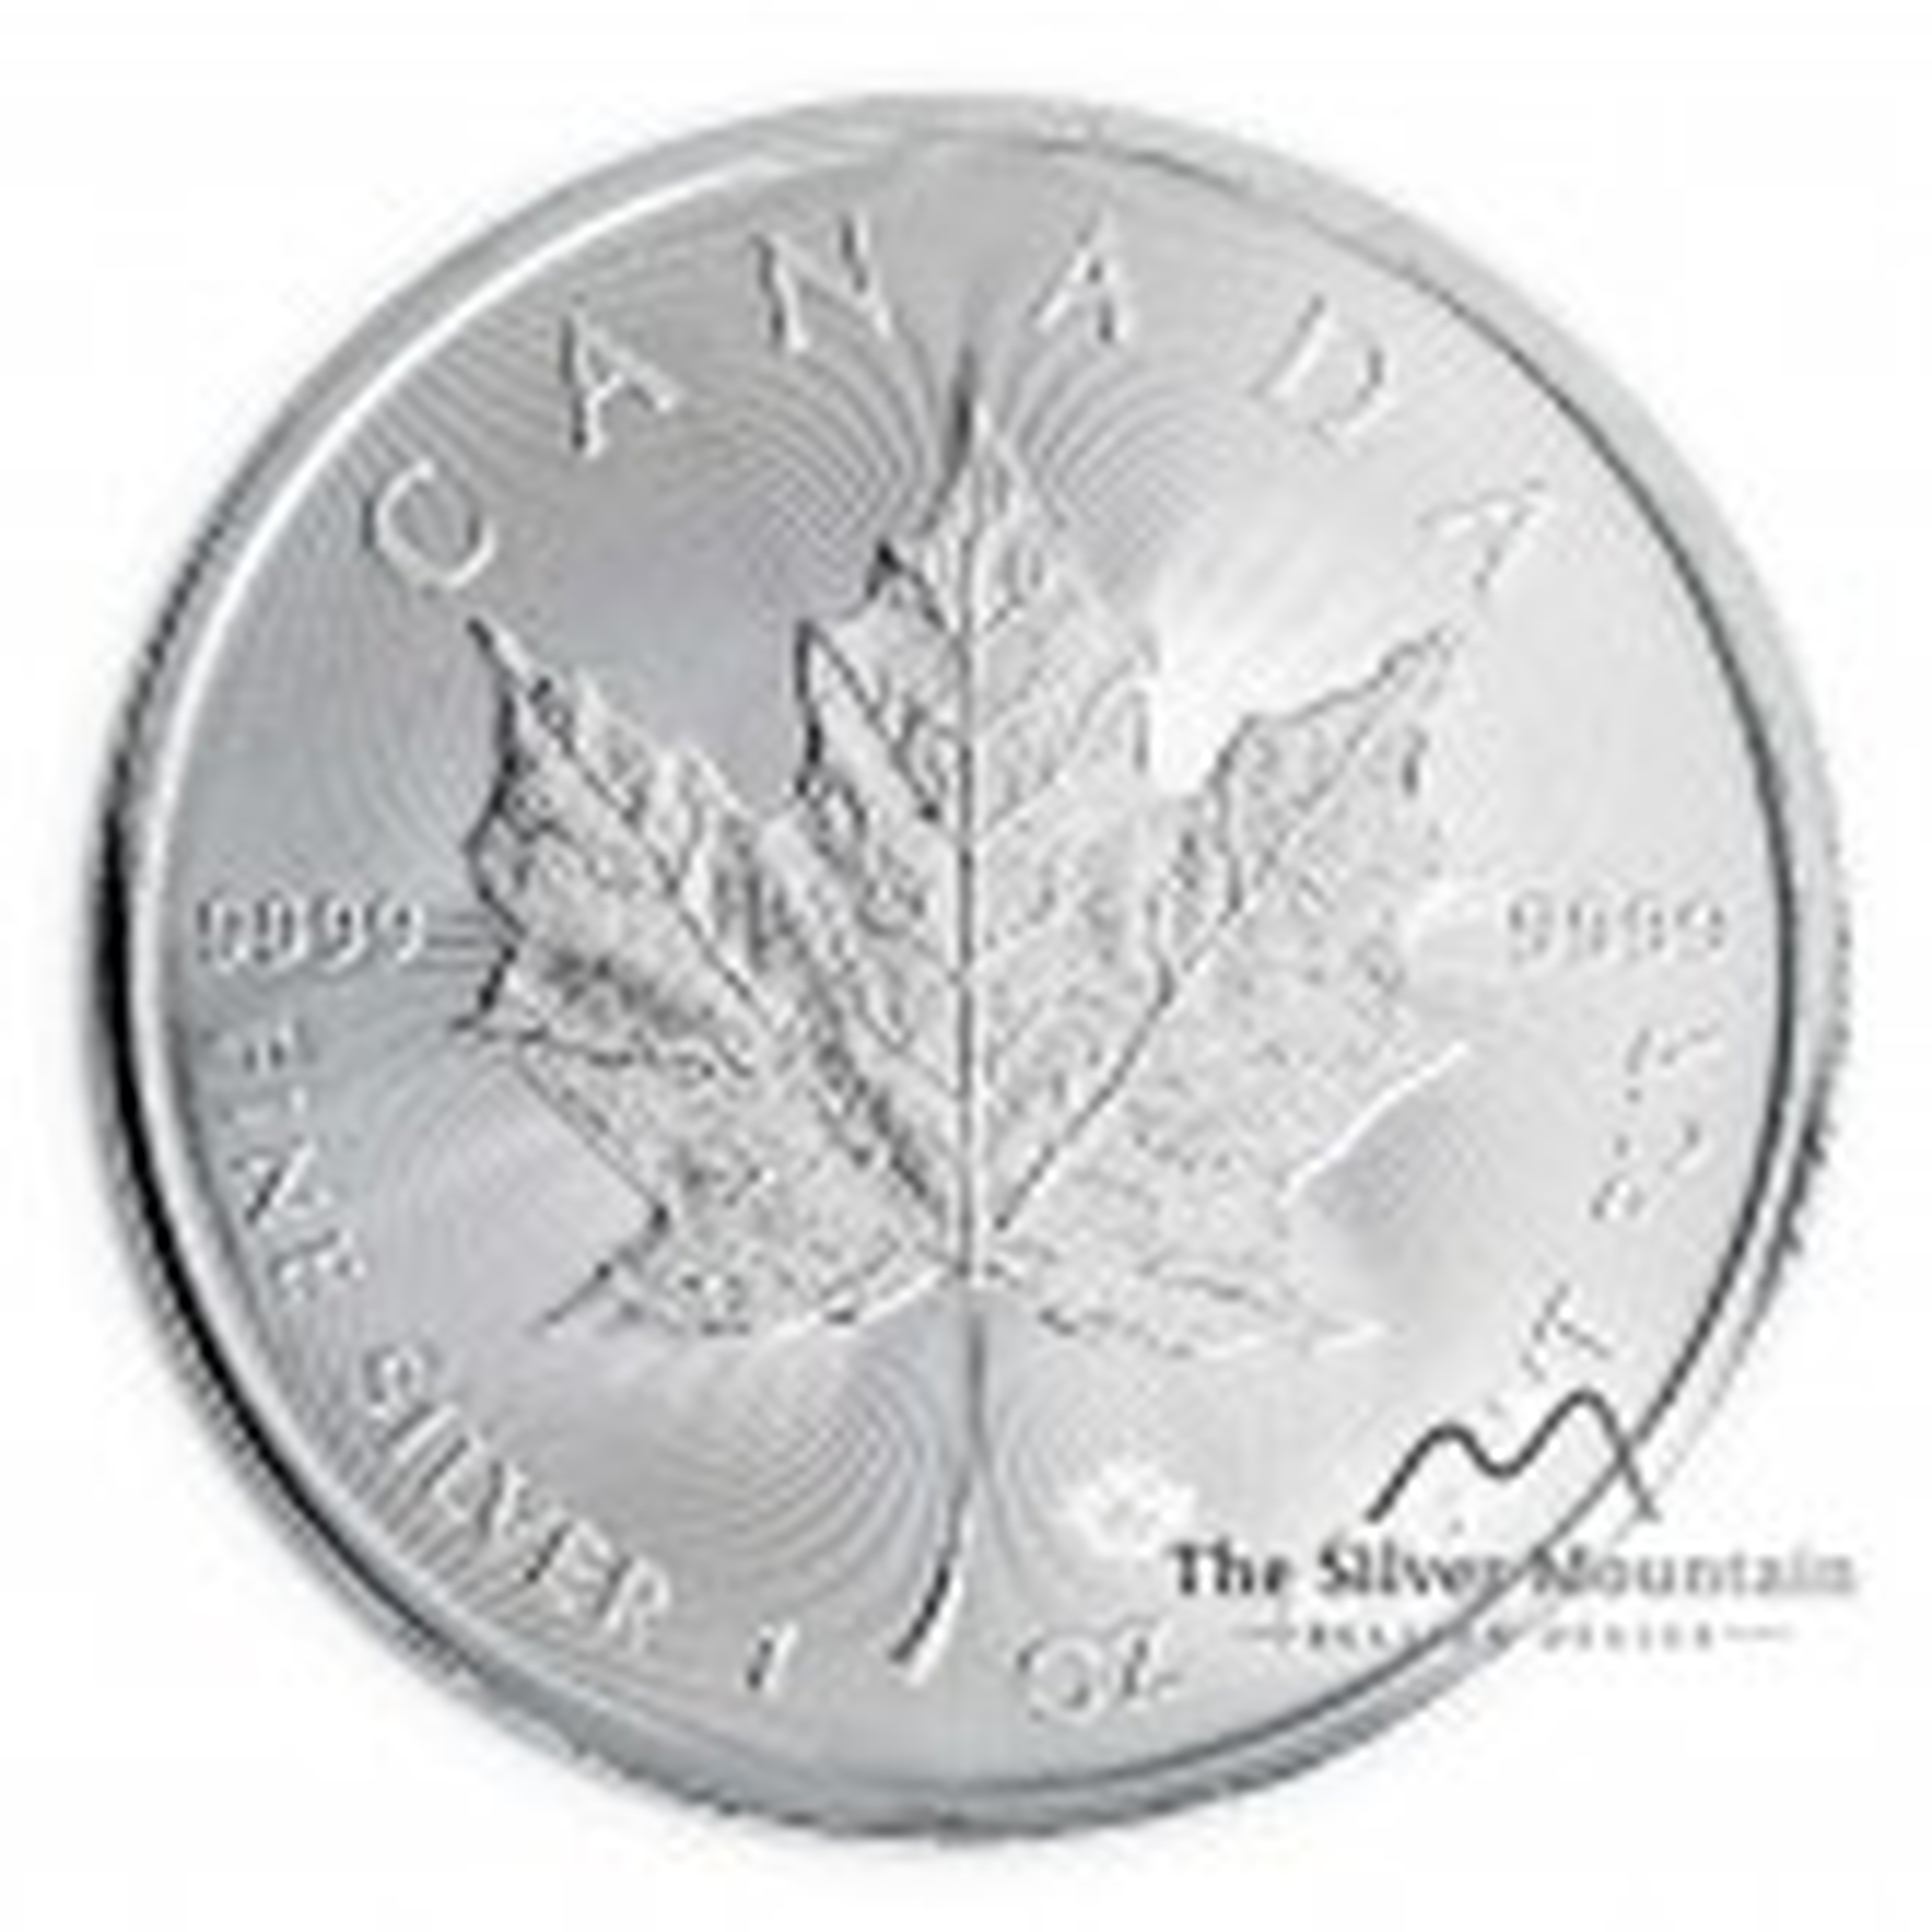 Nieuwe zilveren Maple Leaf munt 2020